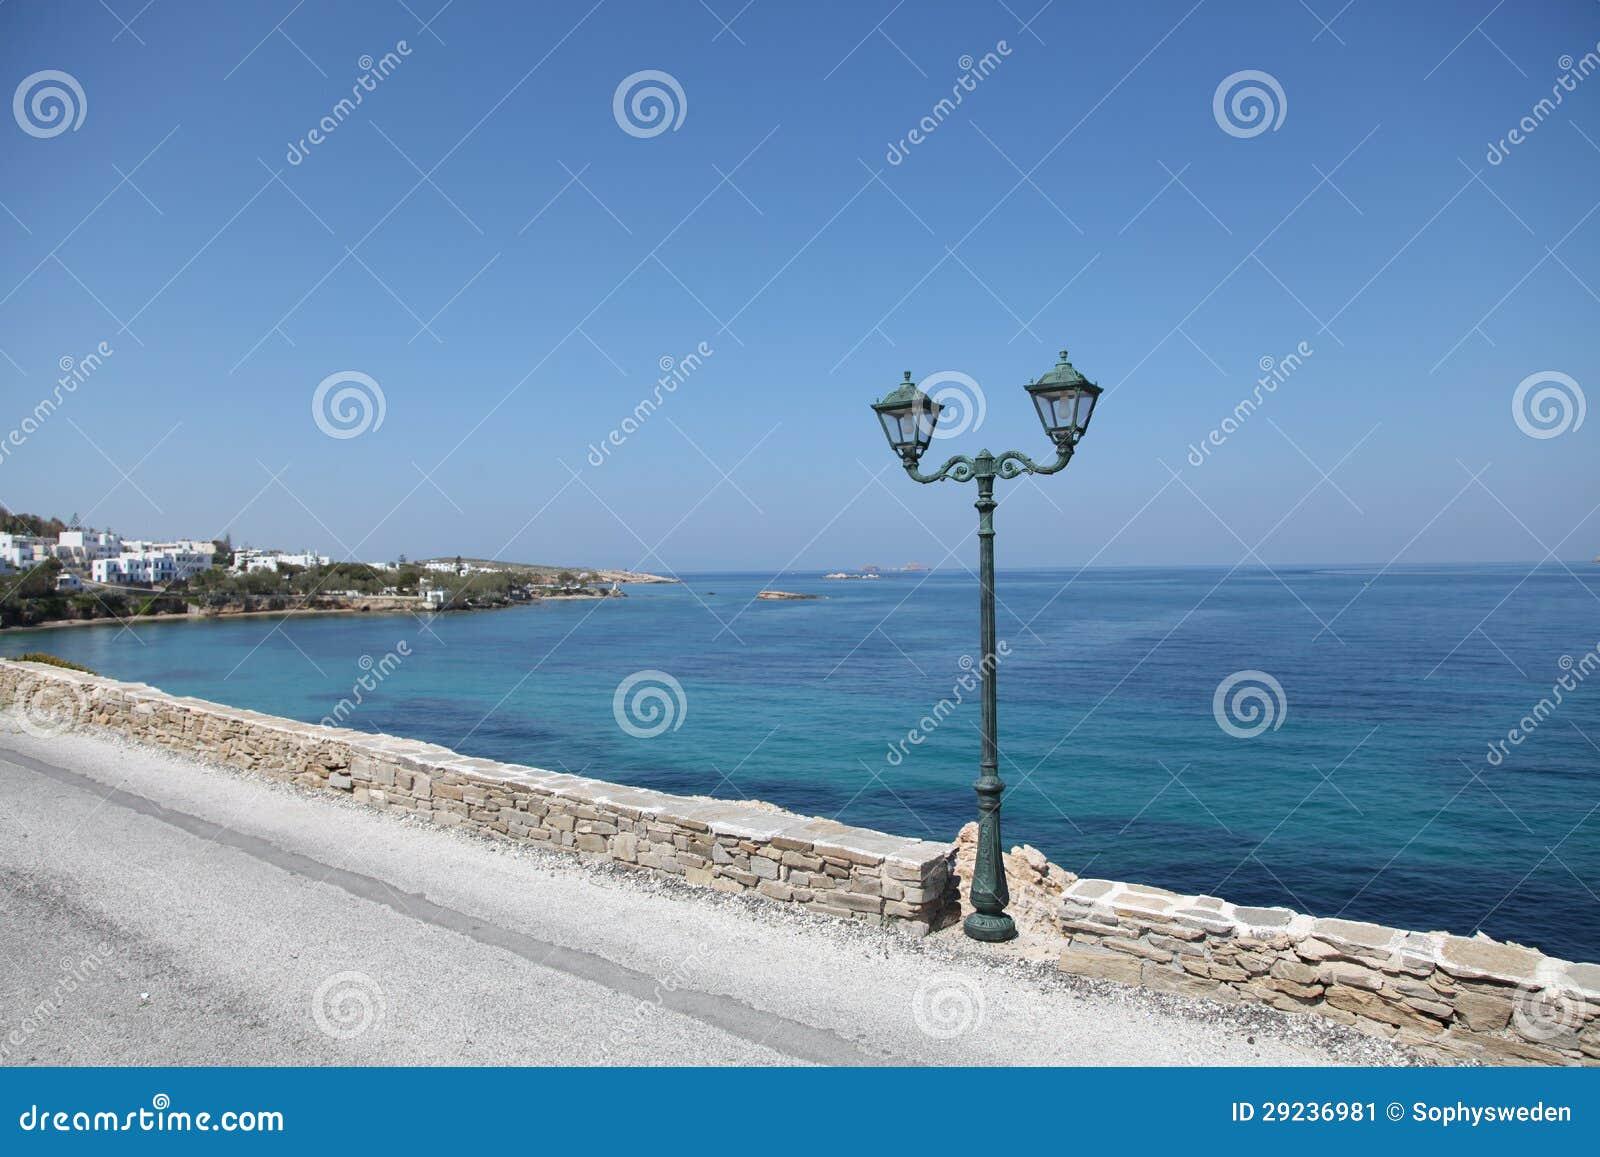 Download Ilha de Paros imagem de stock. Imagem de lâmpada, turquesa - 29236981